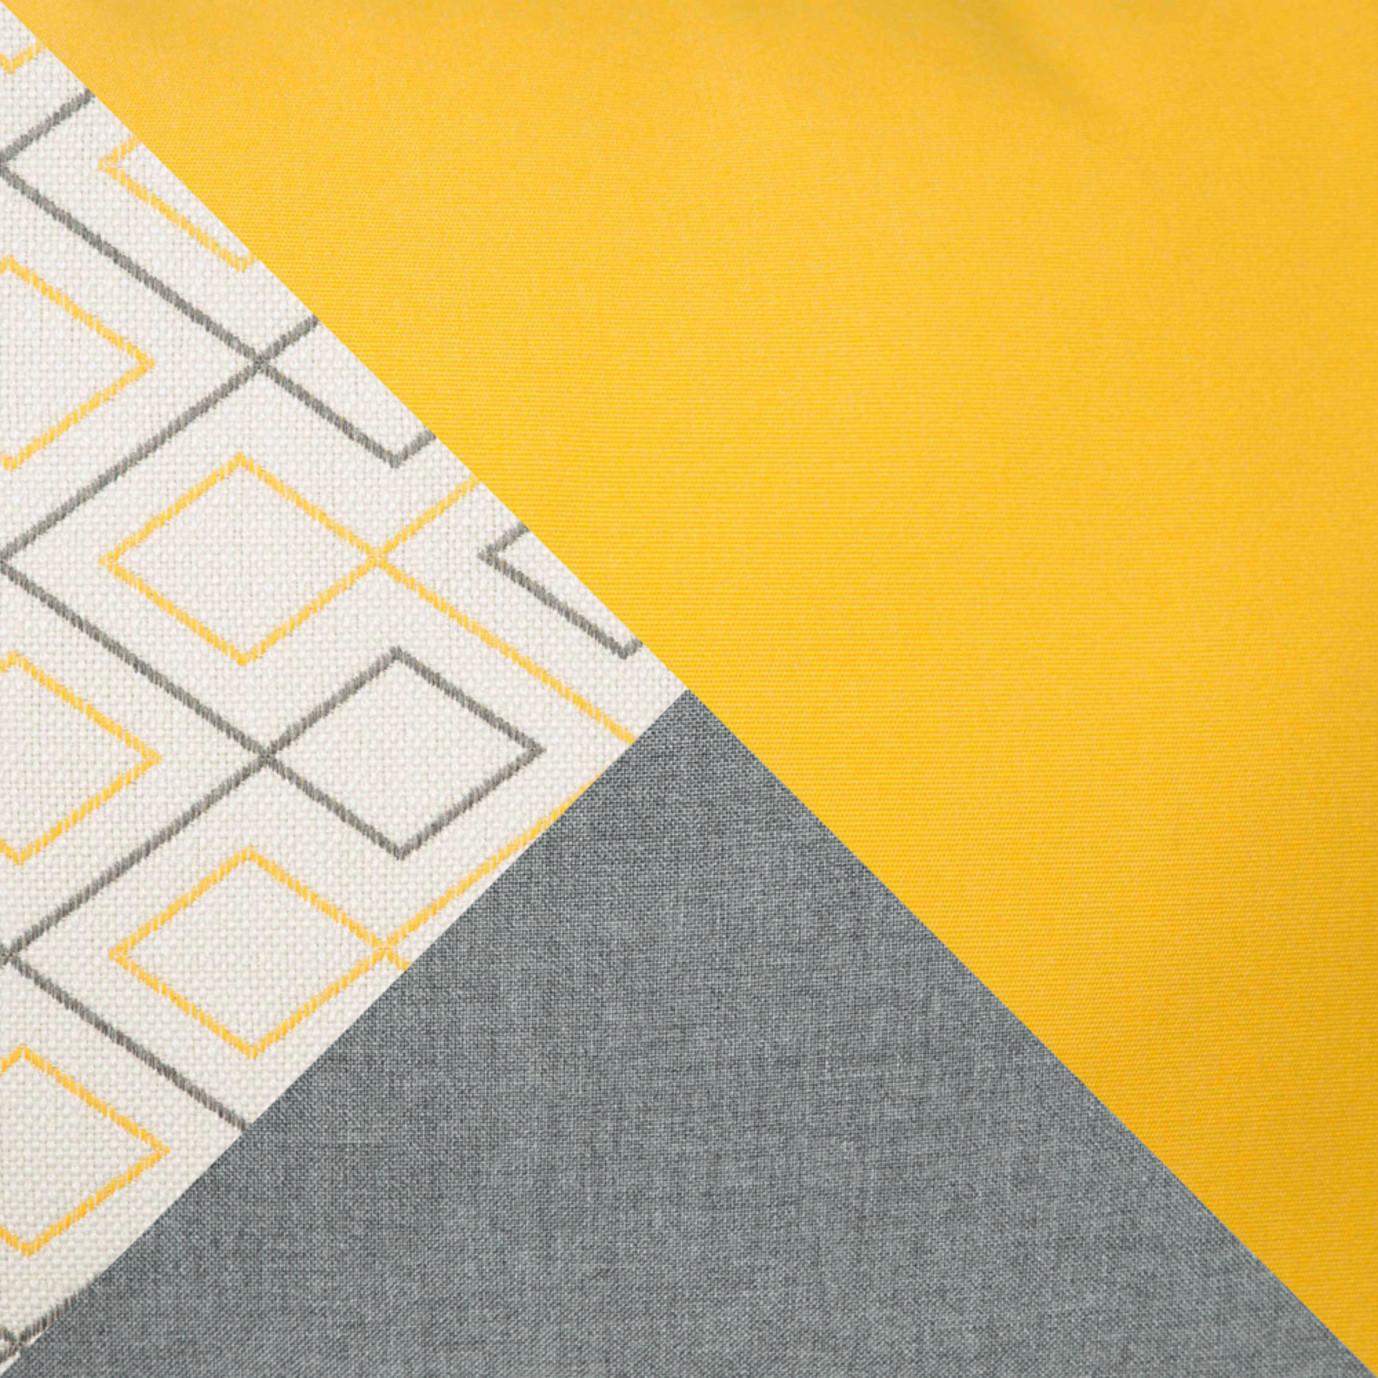 Barcelo™ 4pc Motion Club & Sofa Set - Sunflower Yellow